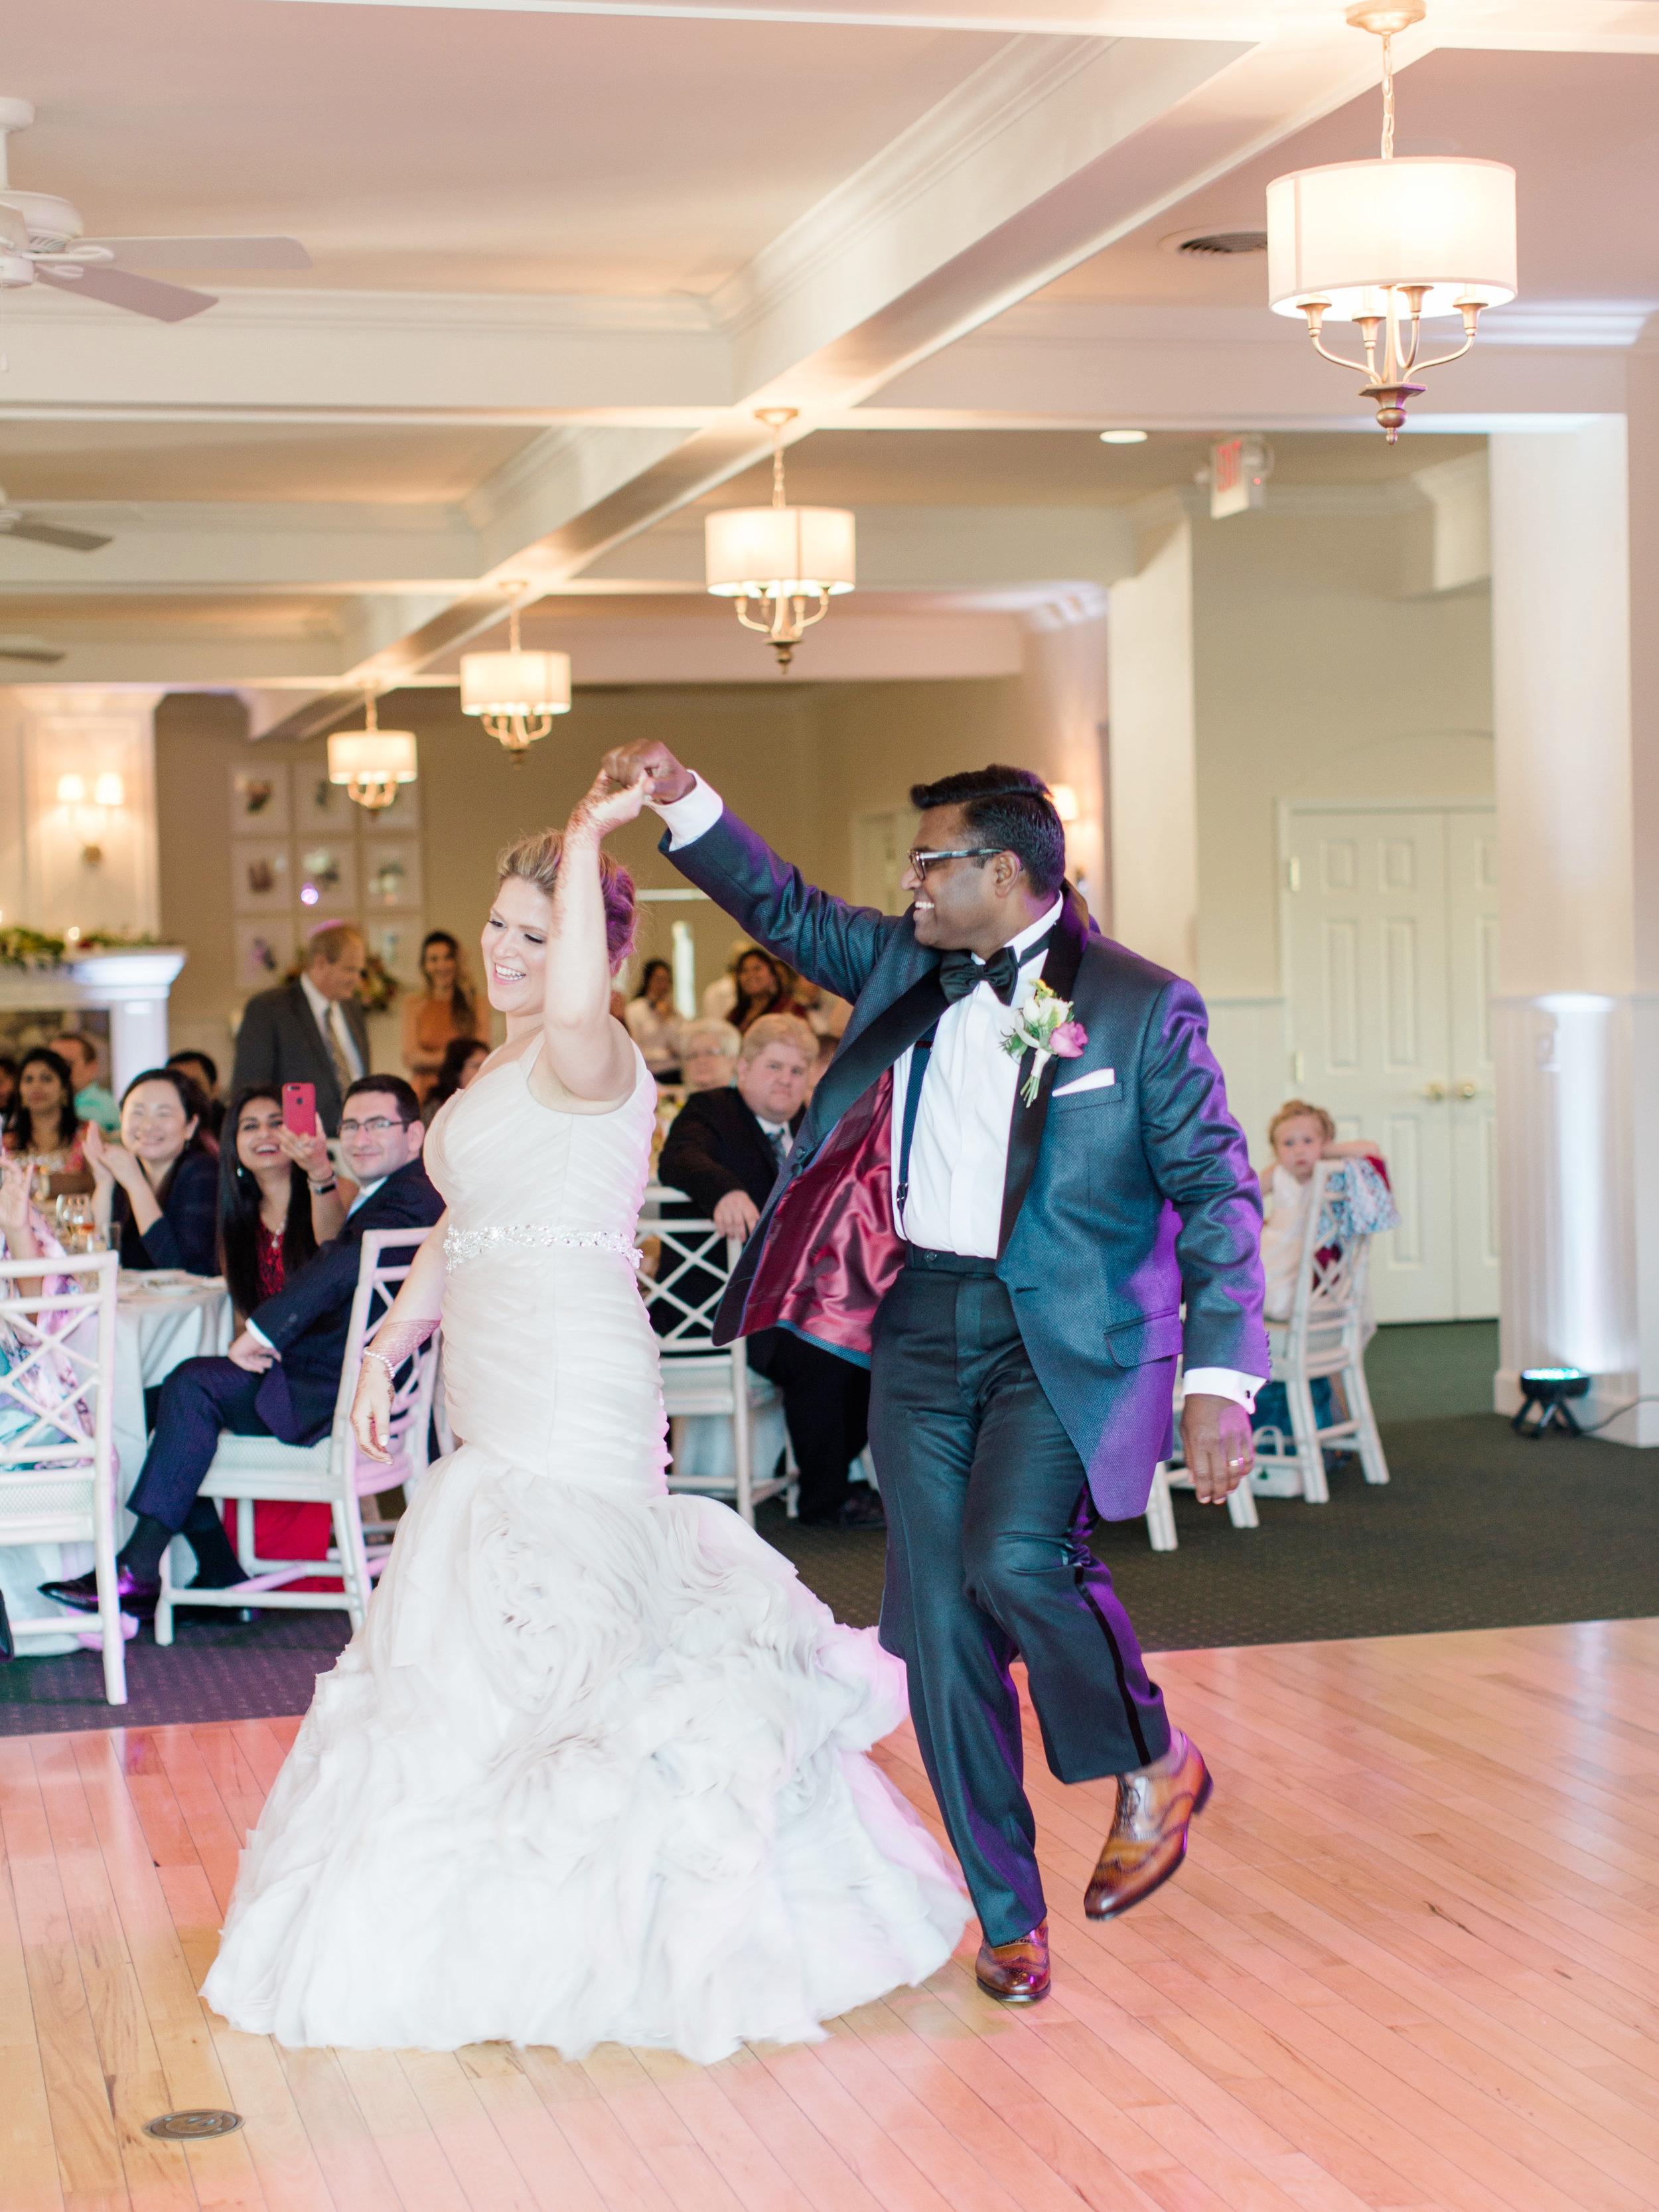 Govathoti+Wedding+Reception+BGFirst Dance-28.jpg